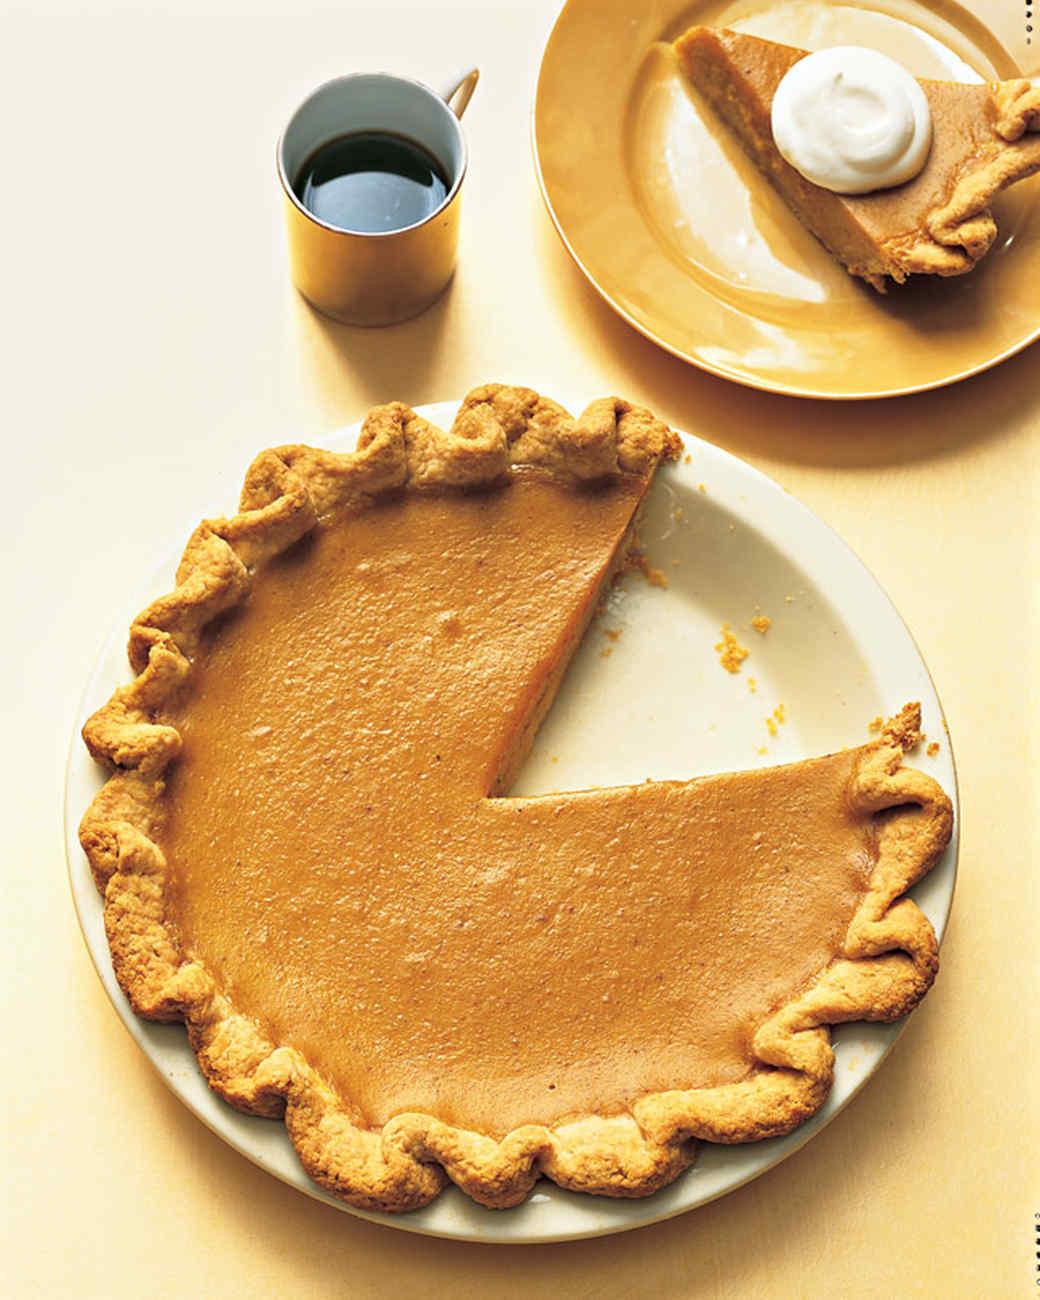 Martha Stewart Christmas Desserts  20 Years of Living The Best Christmas Desserts